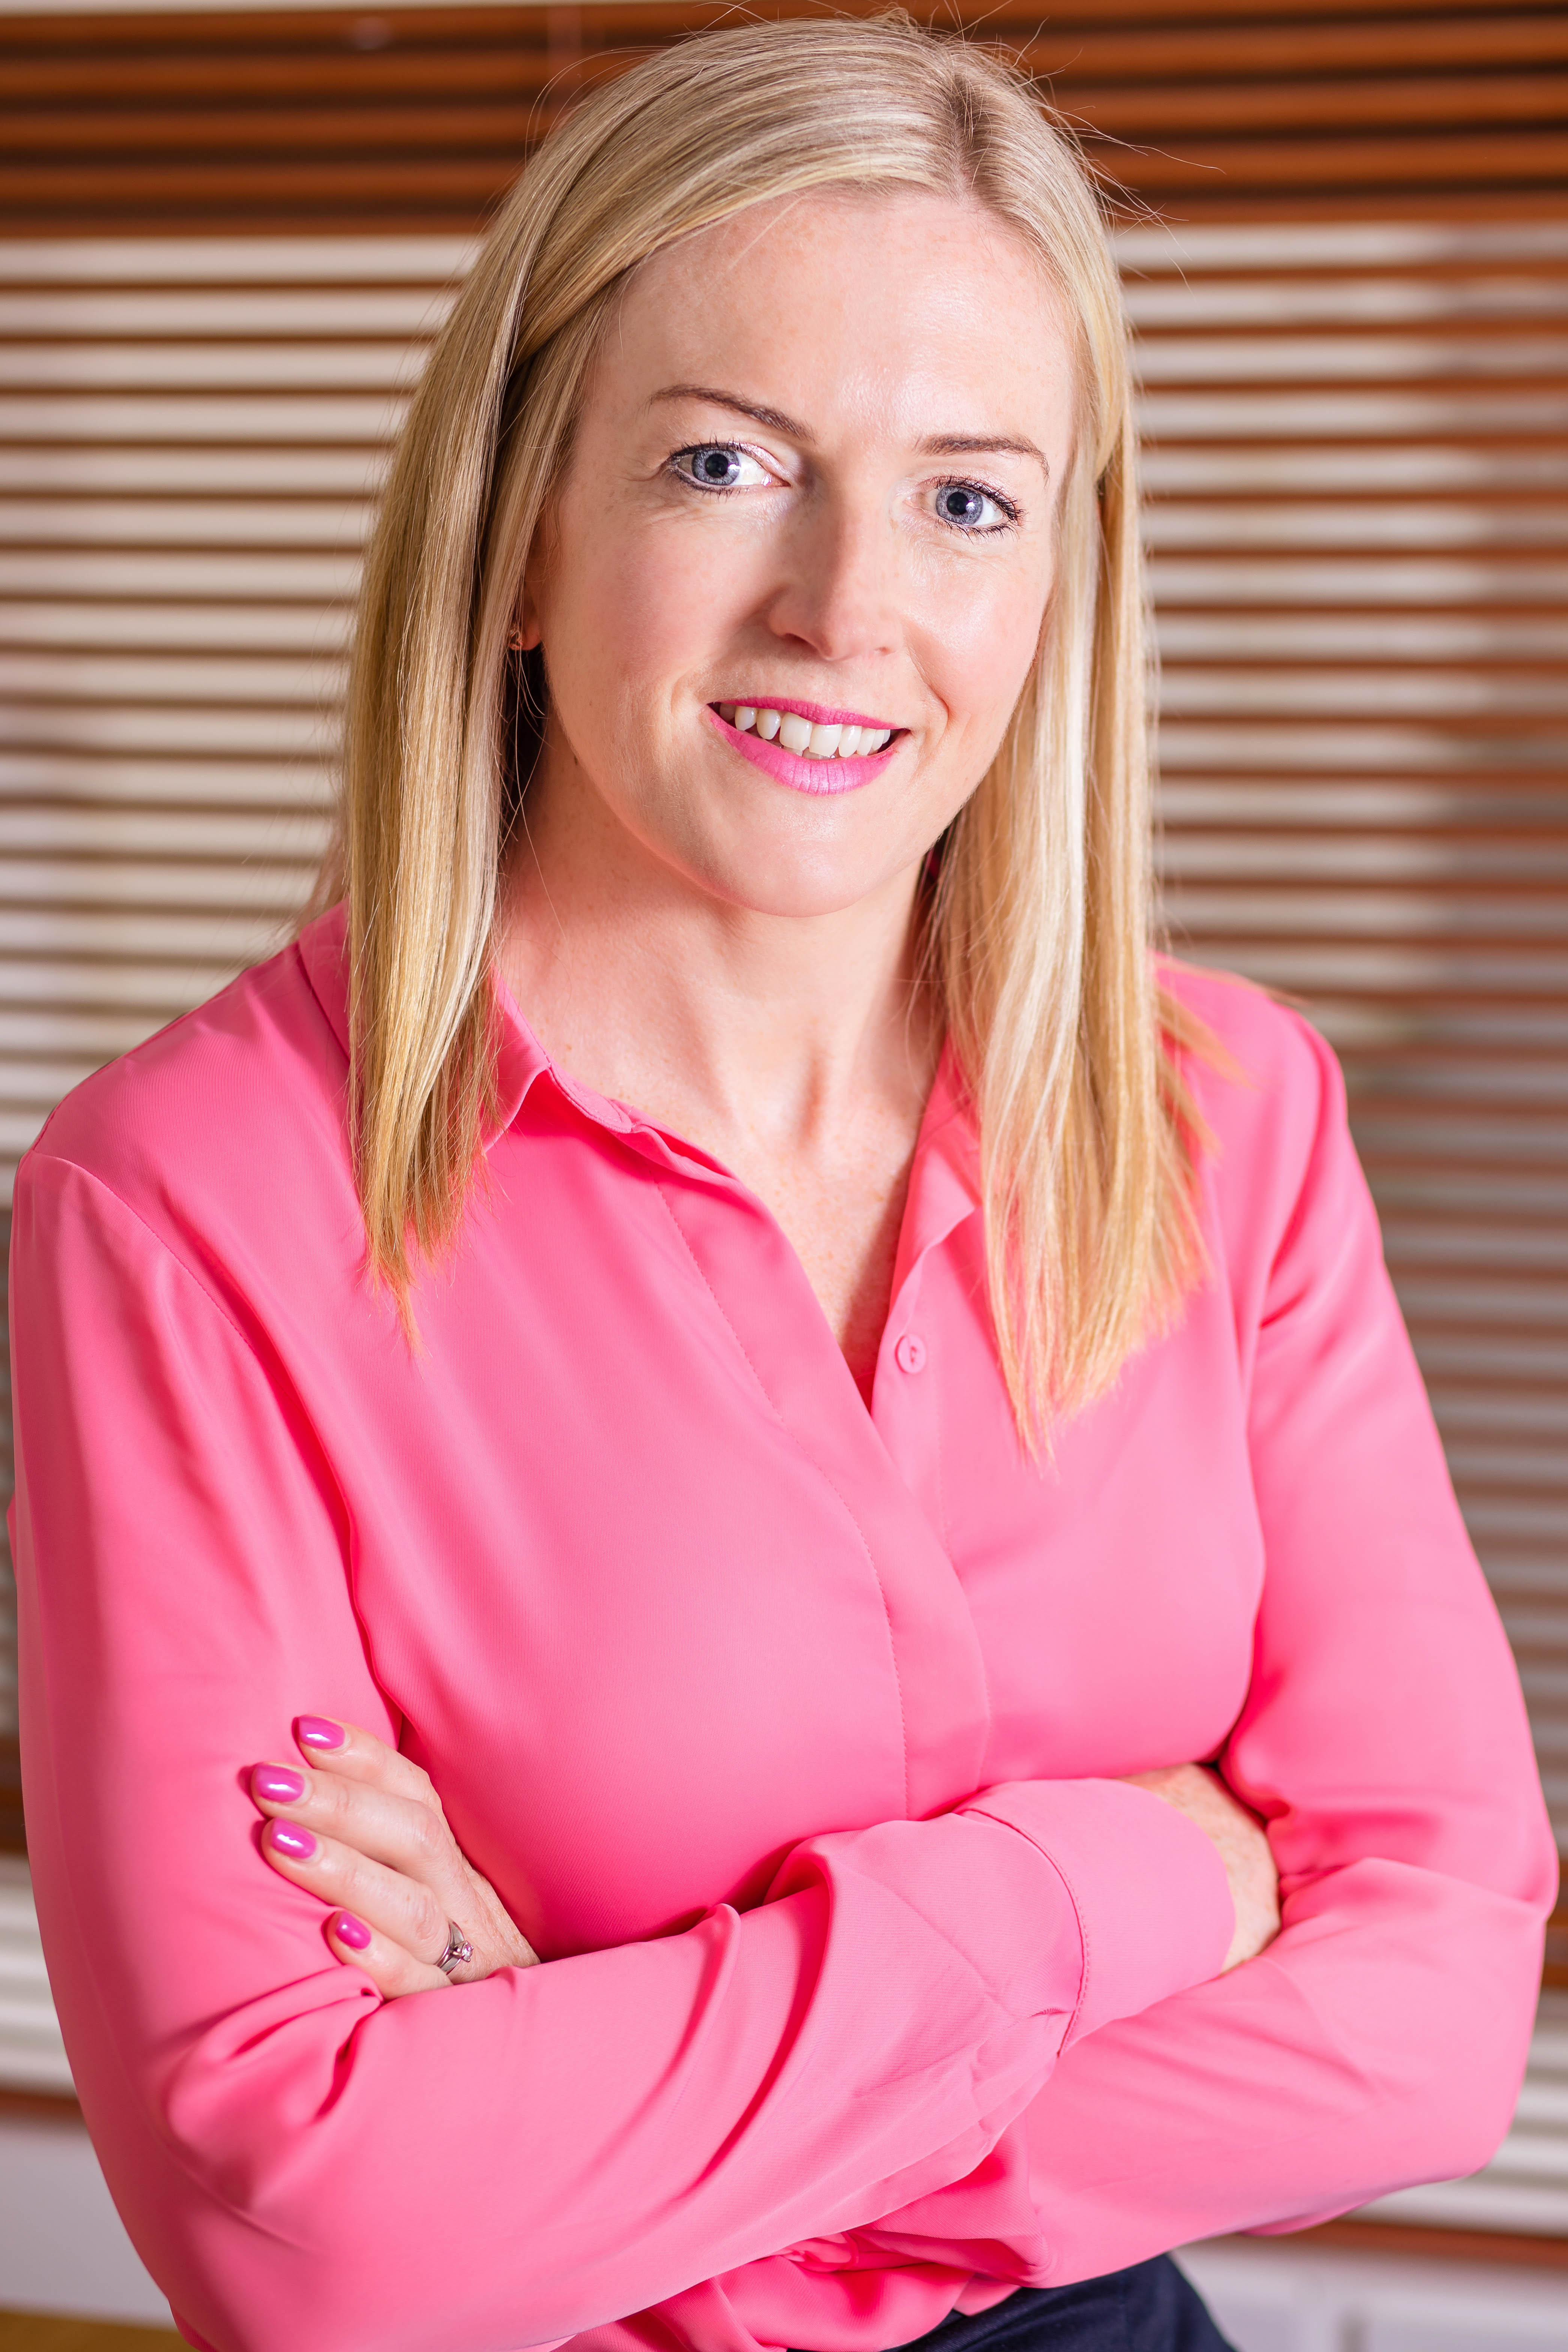 Female corporate headshot - businesswoman in pink shirt